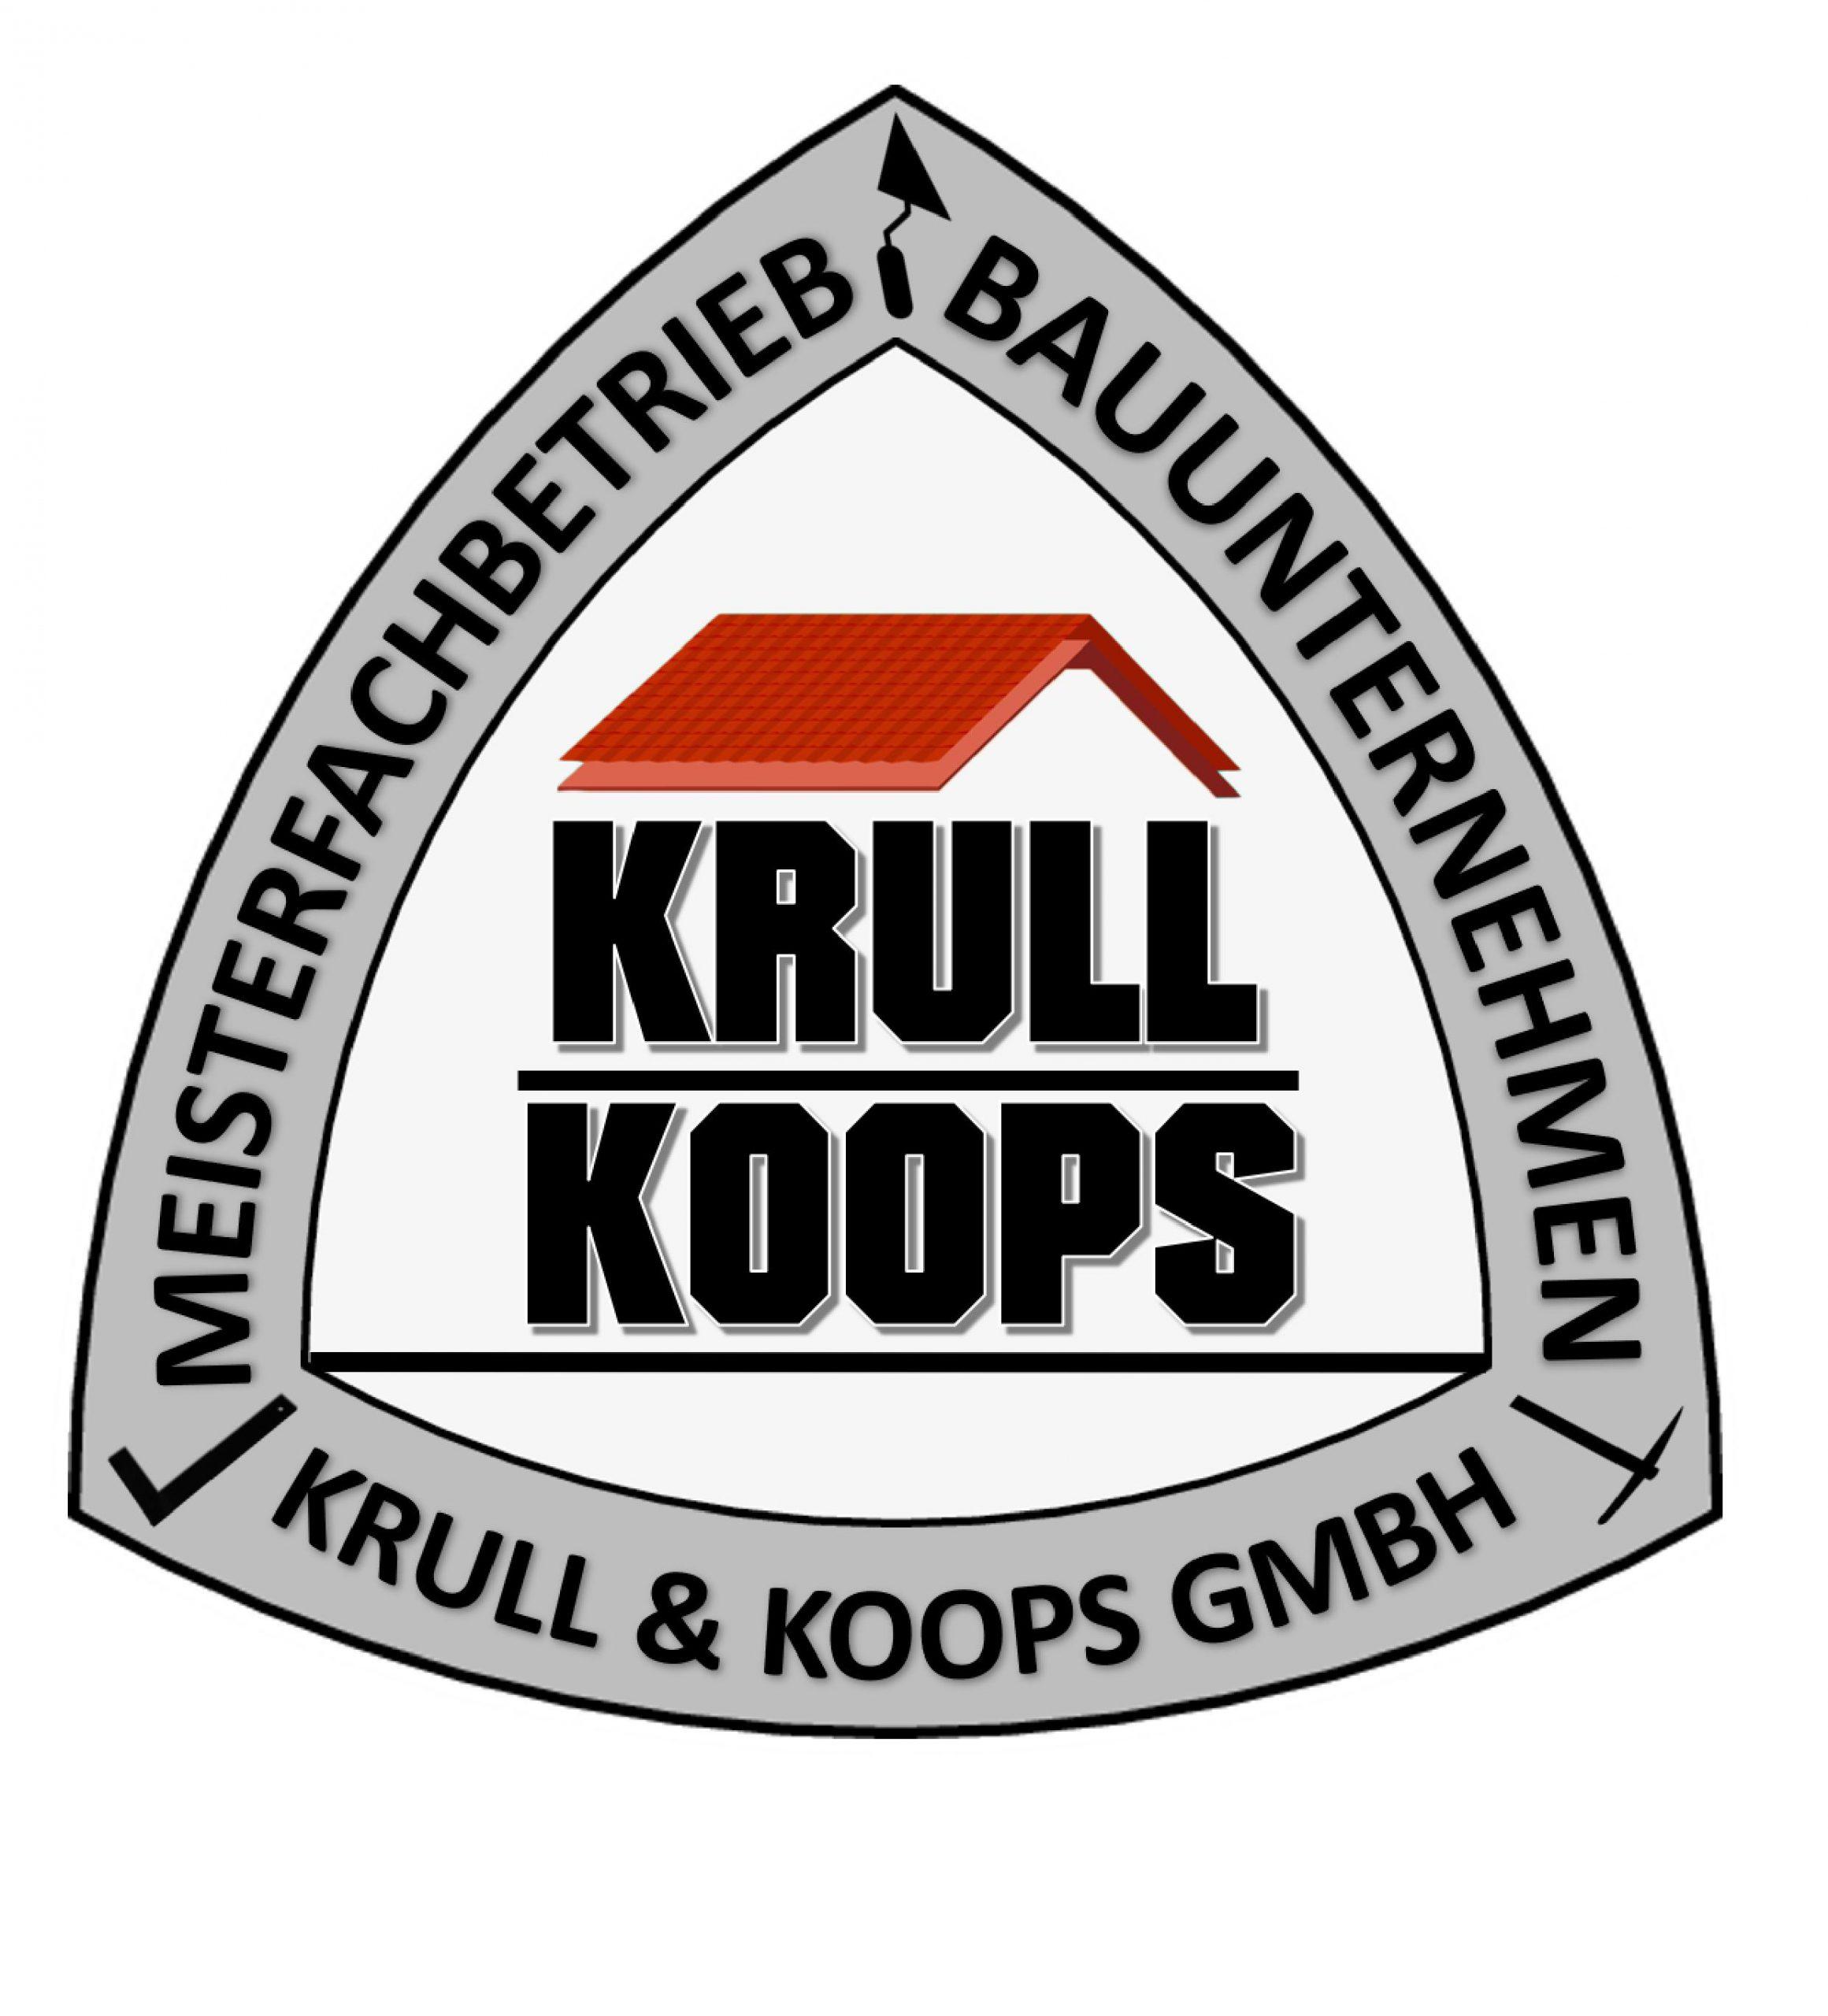 Krull & Koops GmbH